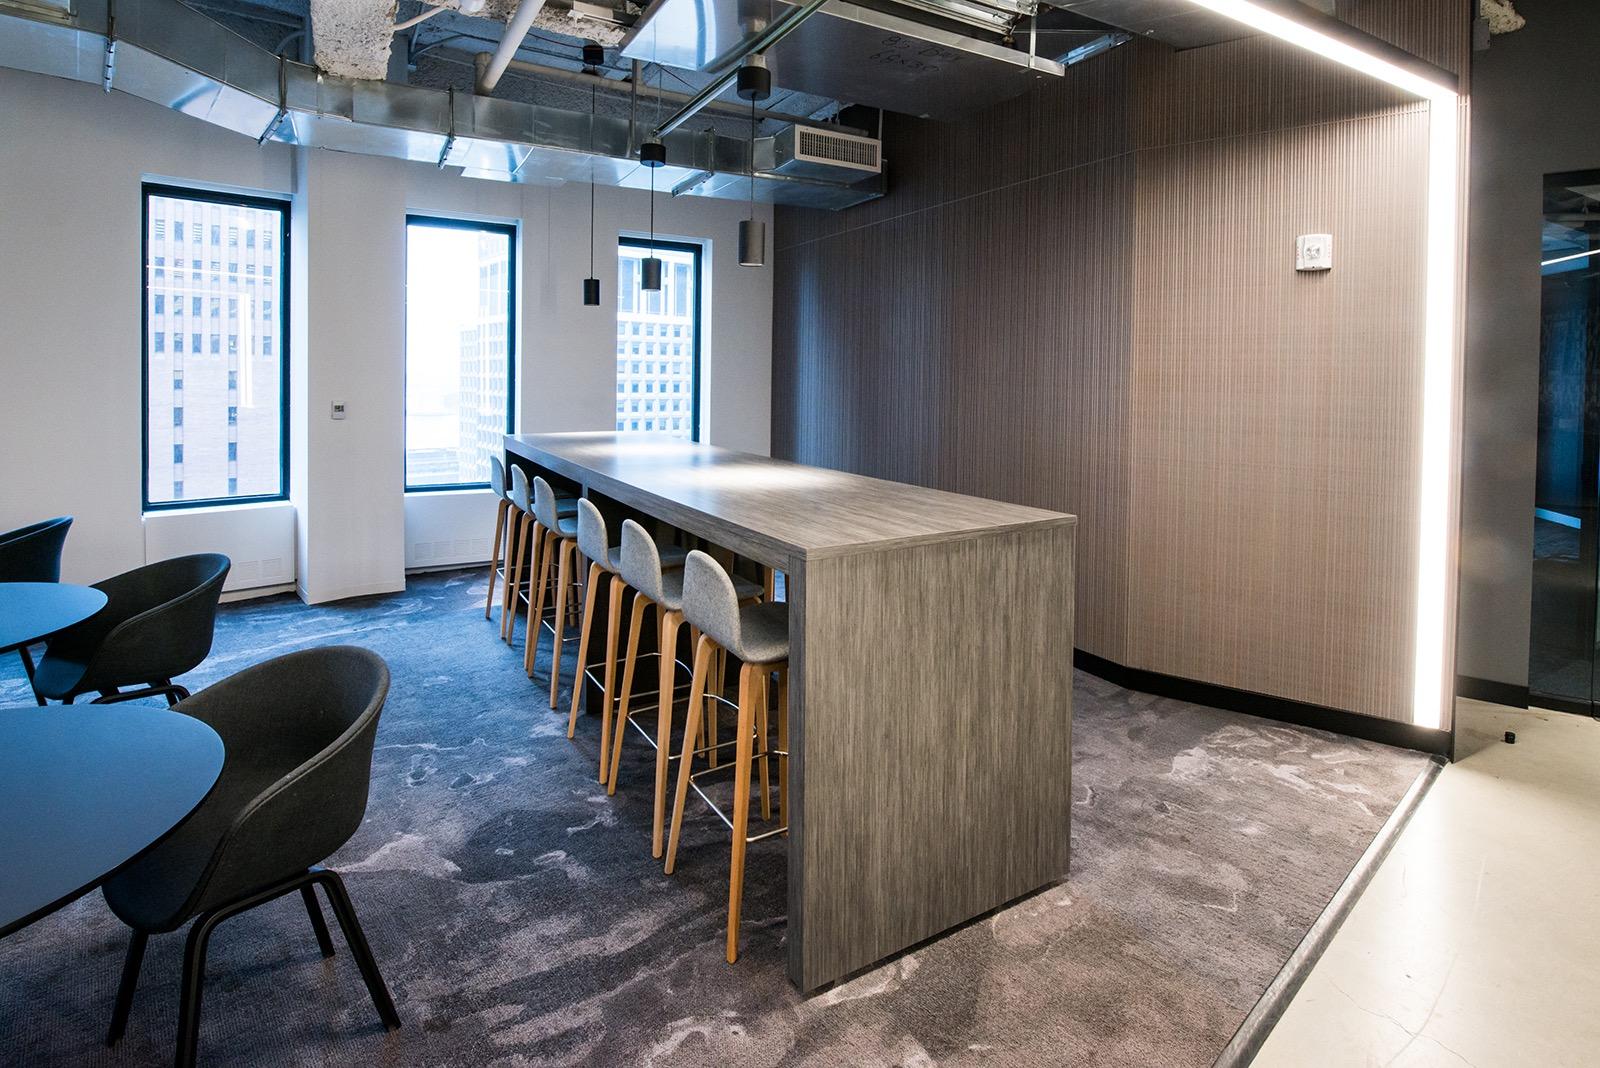 vox-media-nyc-office-8